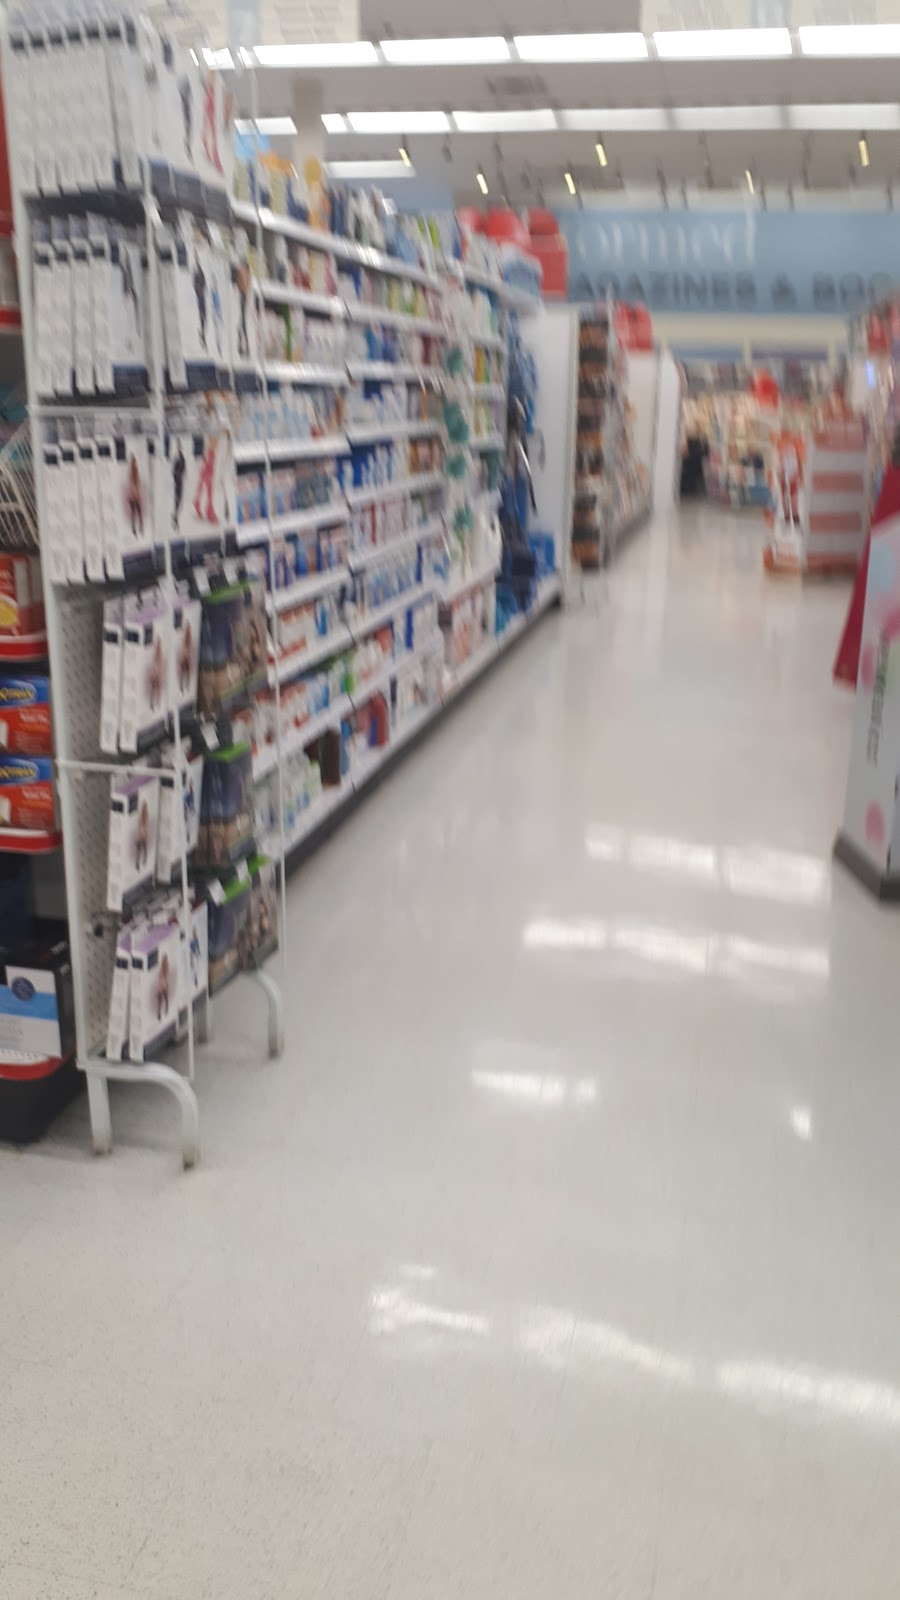 Shoppers Drug Mart | health | 1400 Ottawa St S #100, Kitchener, ON N2E 4E2, Canada | 5197426160 OR +1 519-742-6160